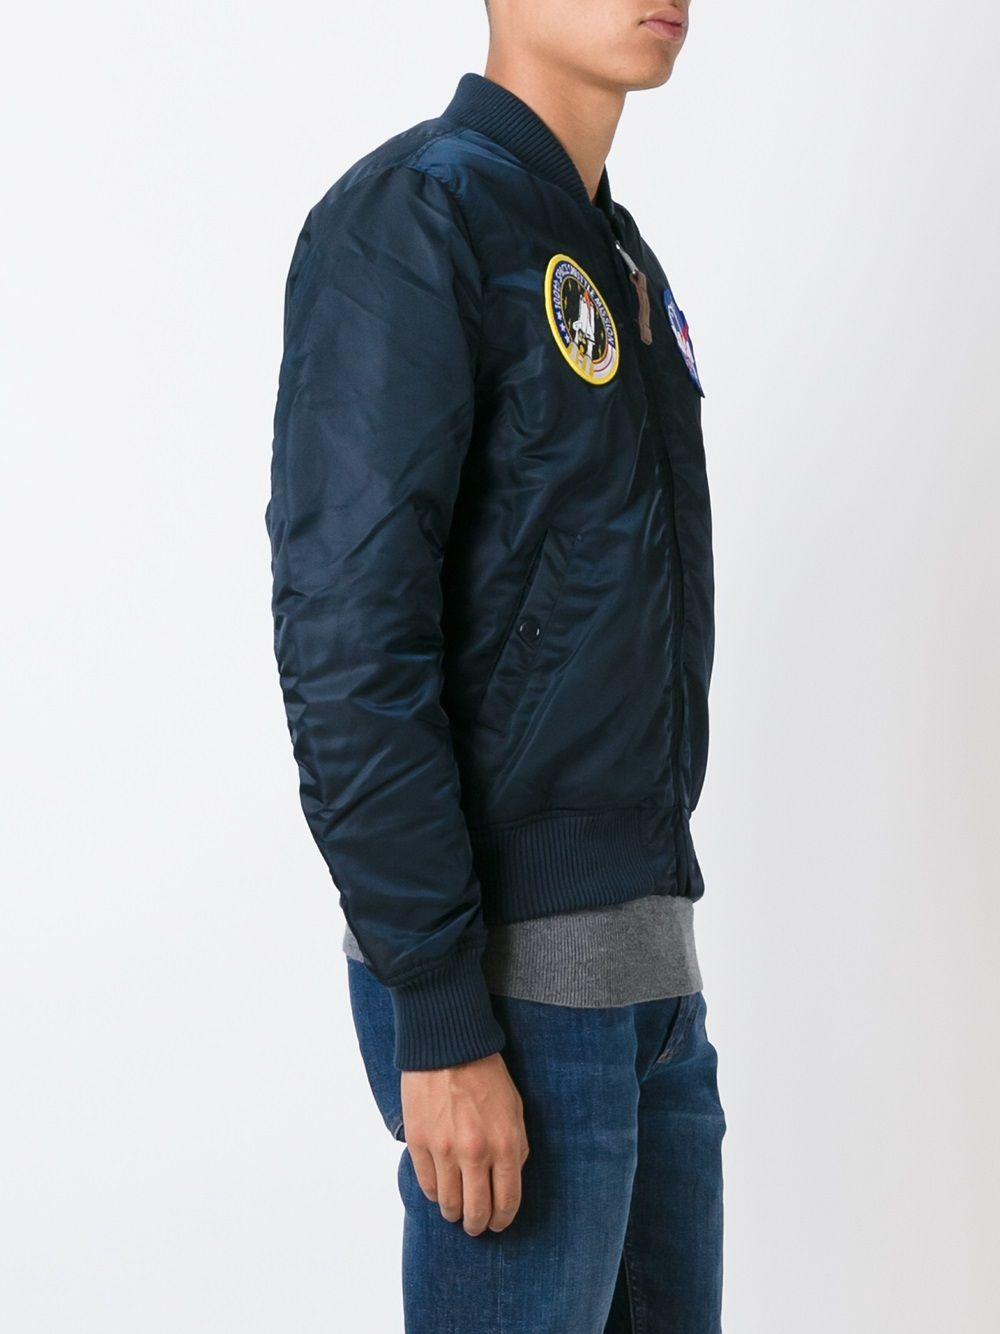 giacca ma1 vf nasa uomo blu in nylon ALPHA INDUSTRIES | Giacche | 16610707